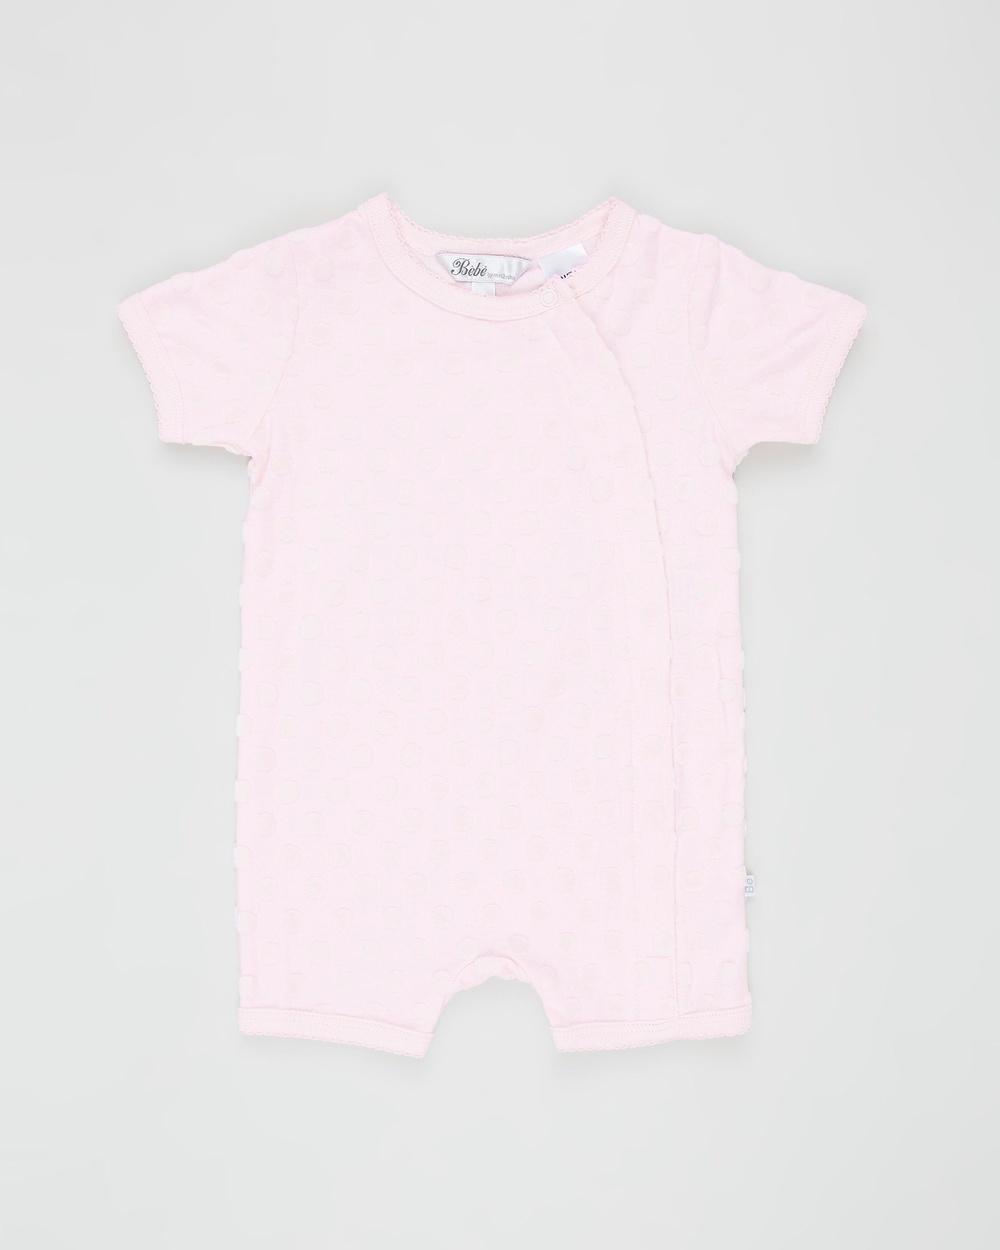 Bebe by Minihaha Spot Layette Short Sleeve Romper Babies Shortsleeve Rompers Pink Circle